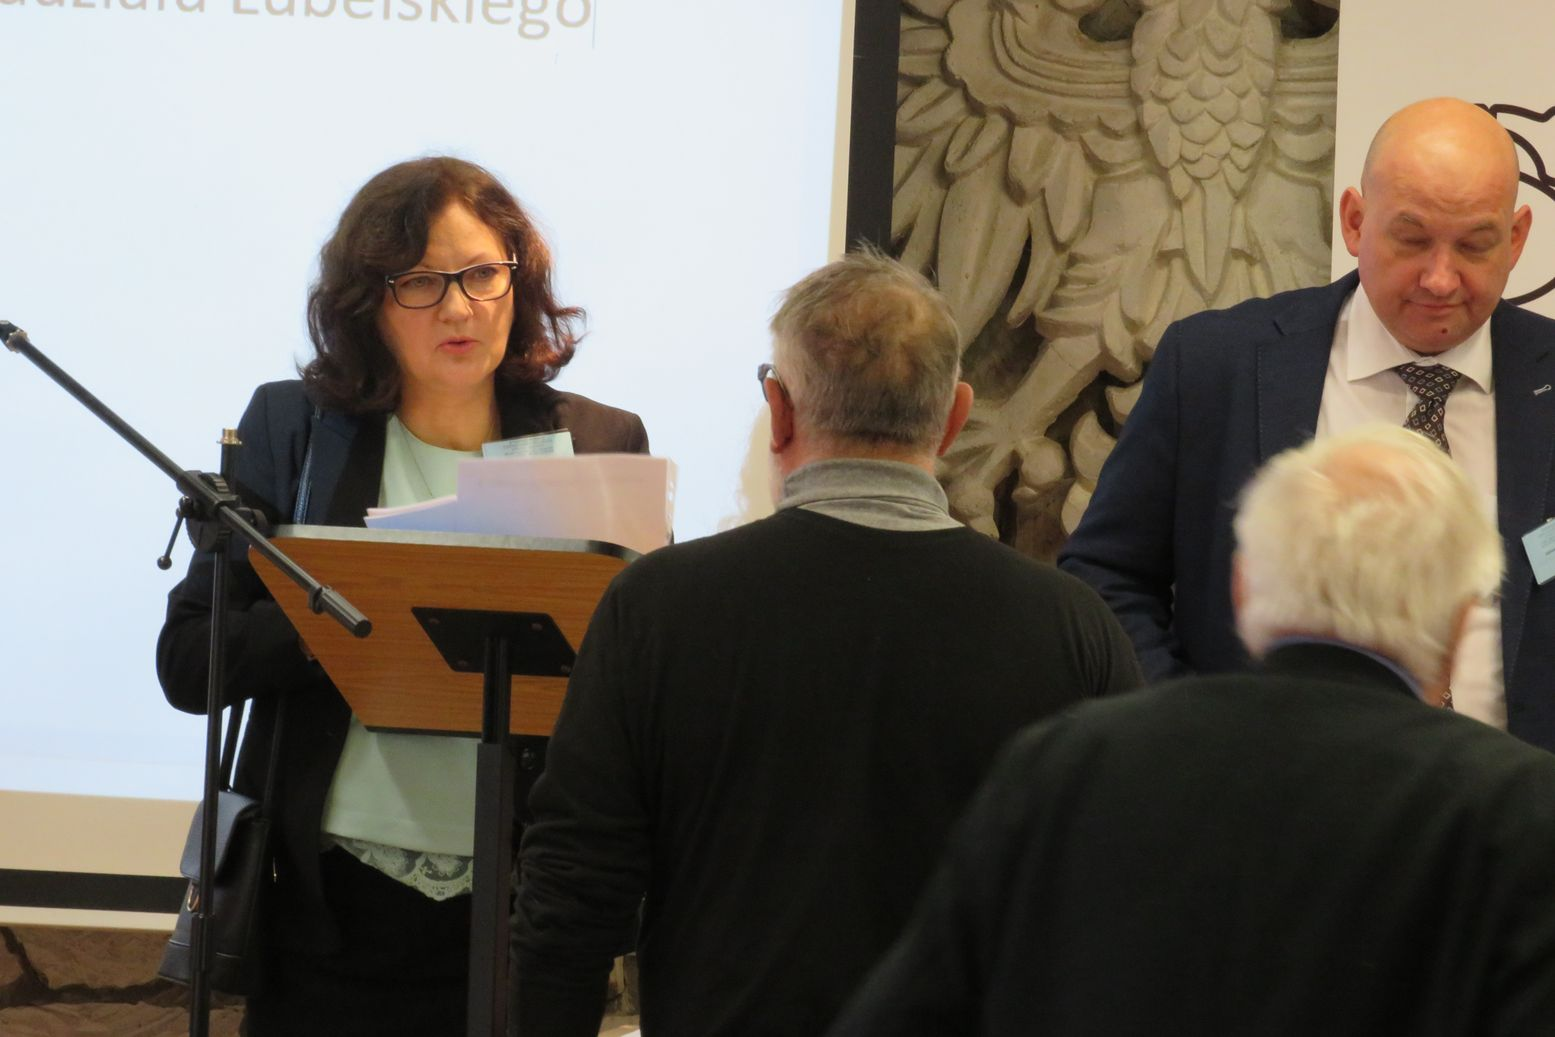 Dyrektor Biura SDP Bożenna Dobrzyńska